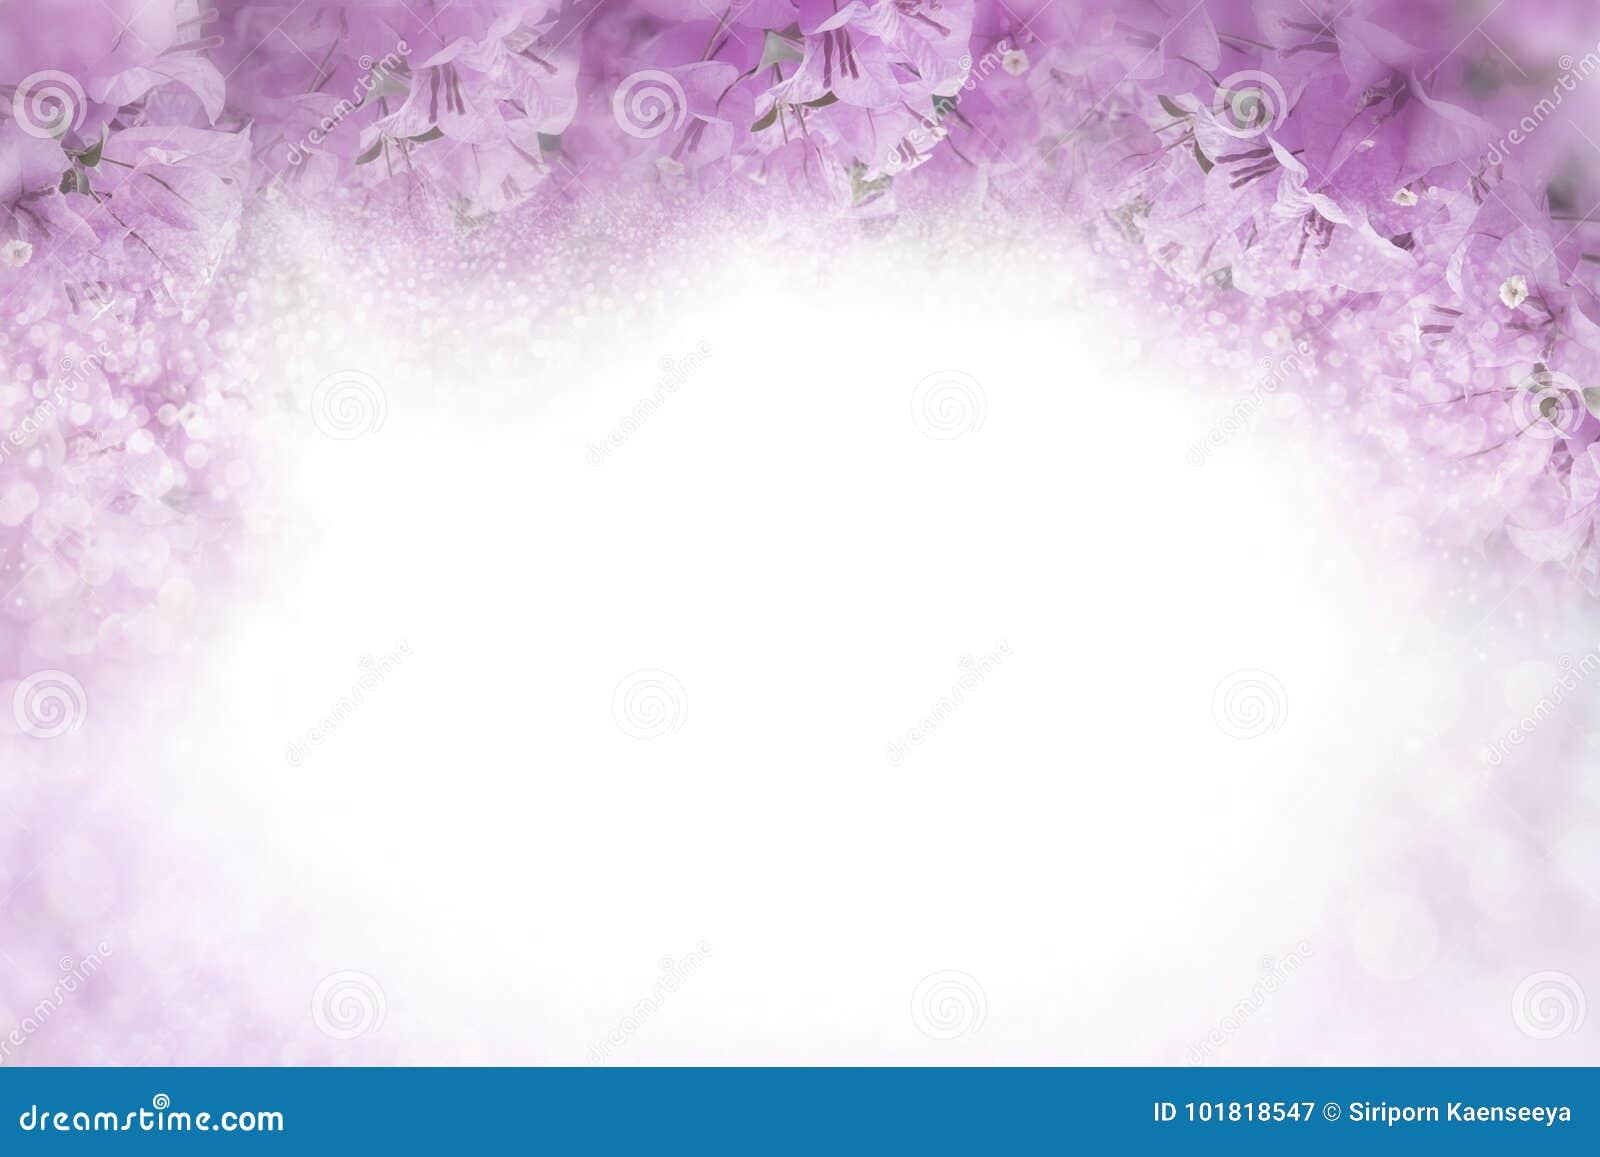 Purple Flower Bougainvillea Frame On Soft Pink Background Valentine